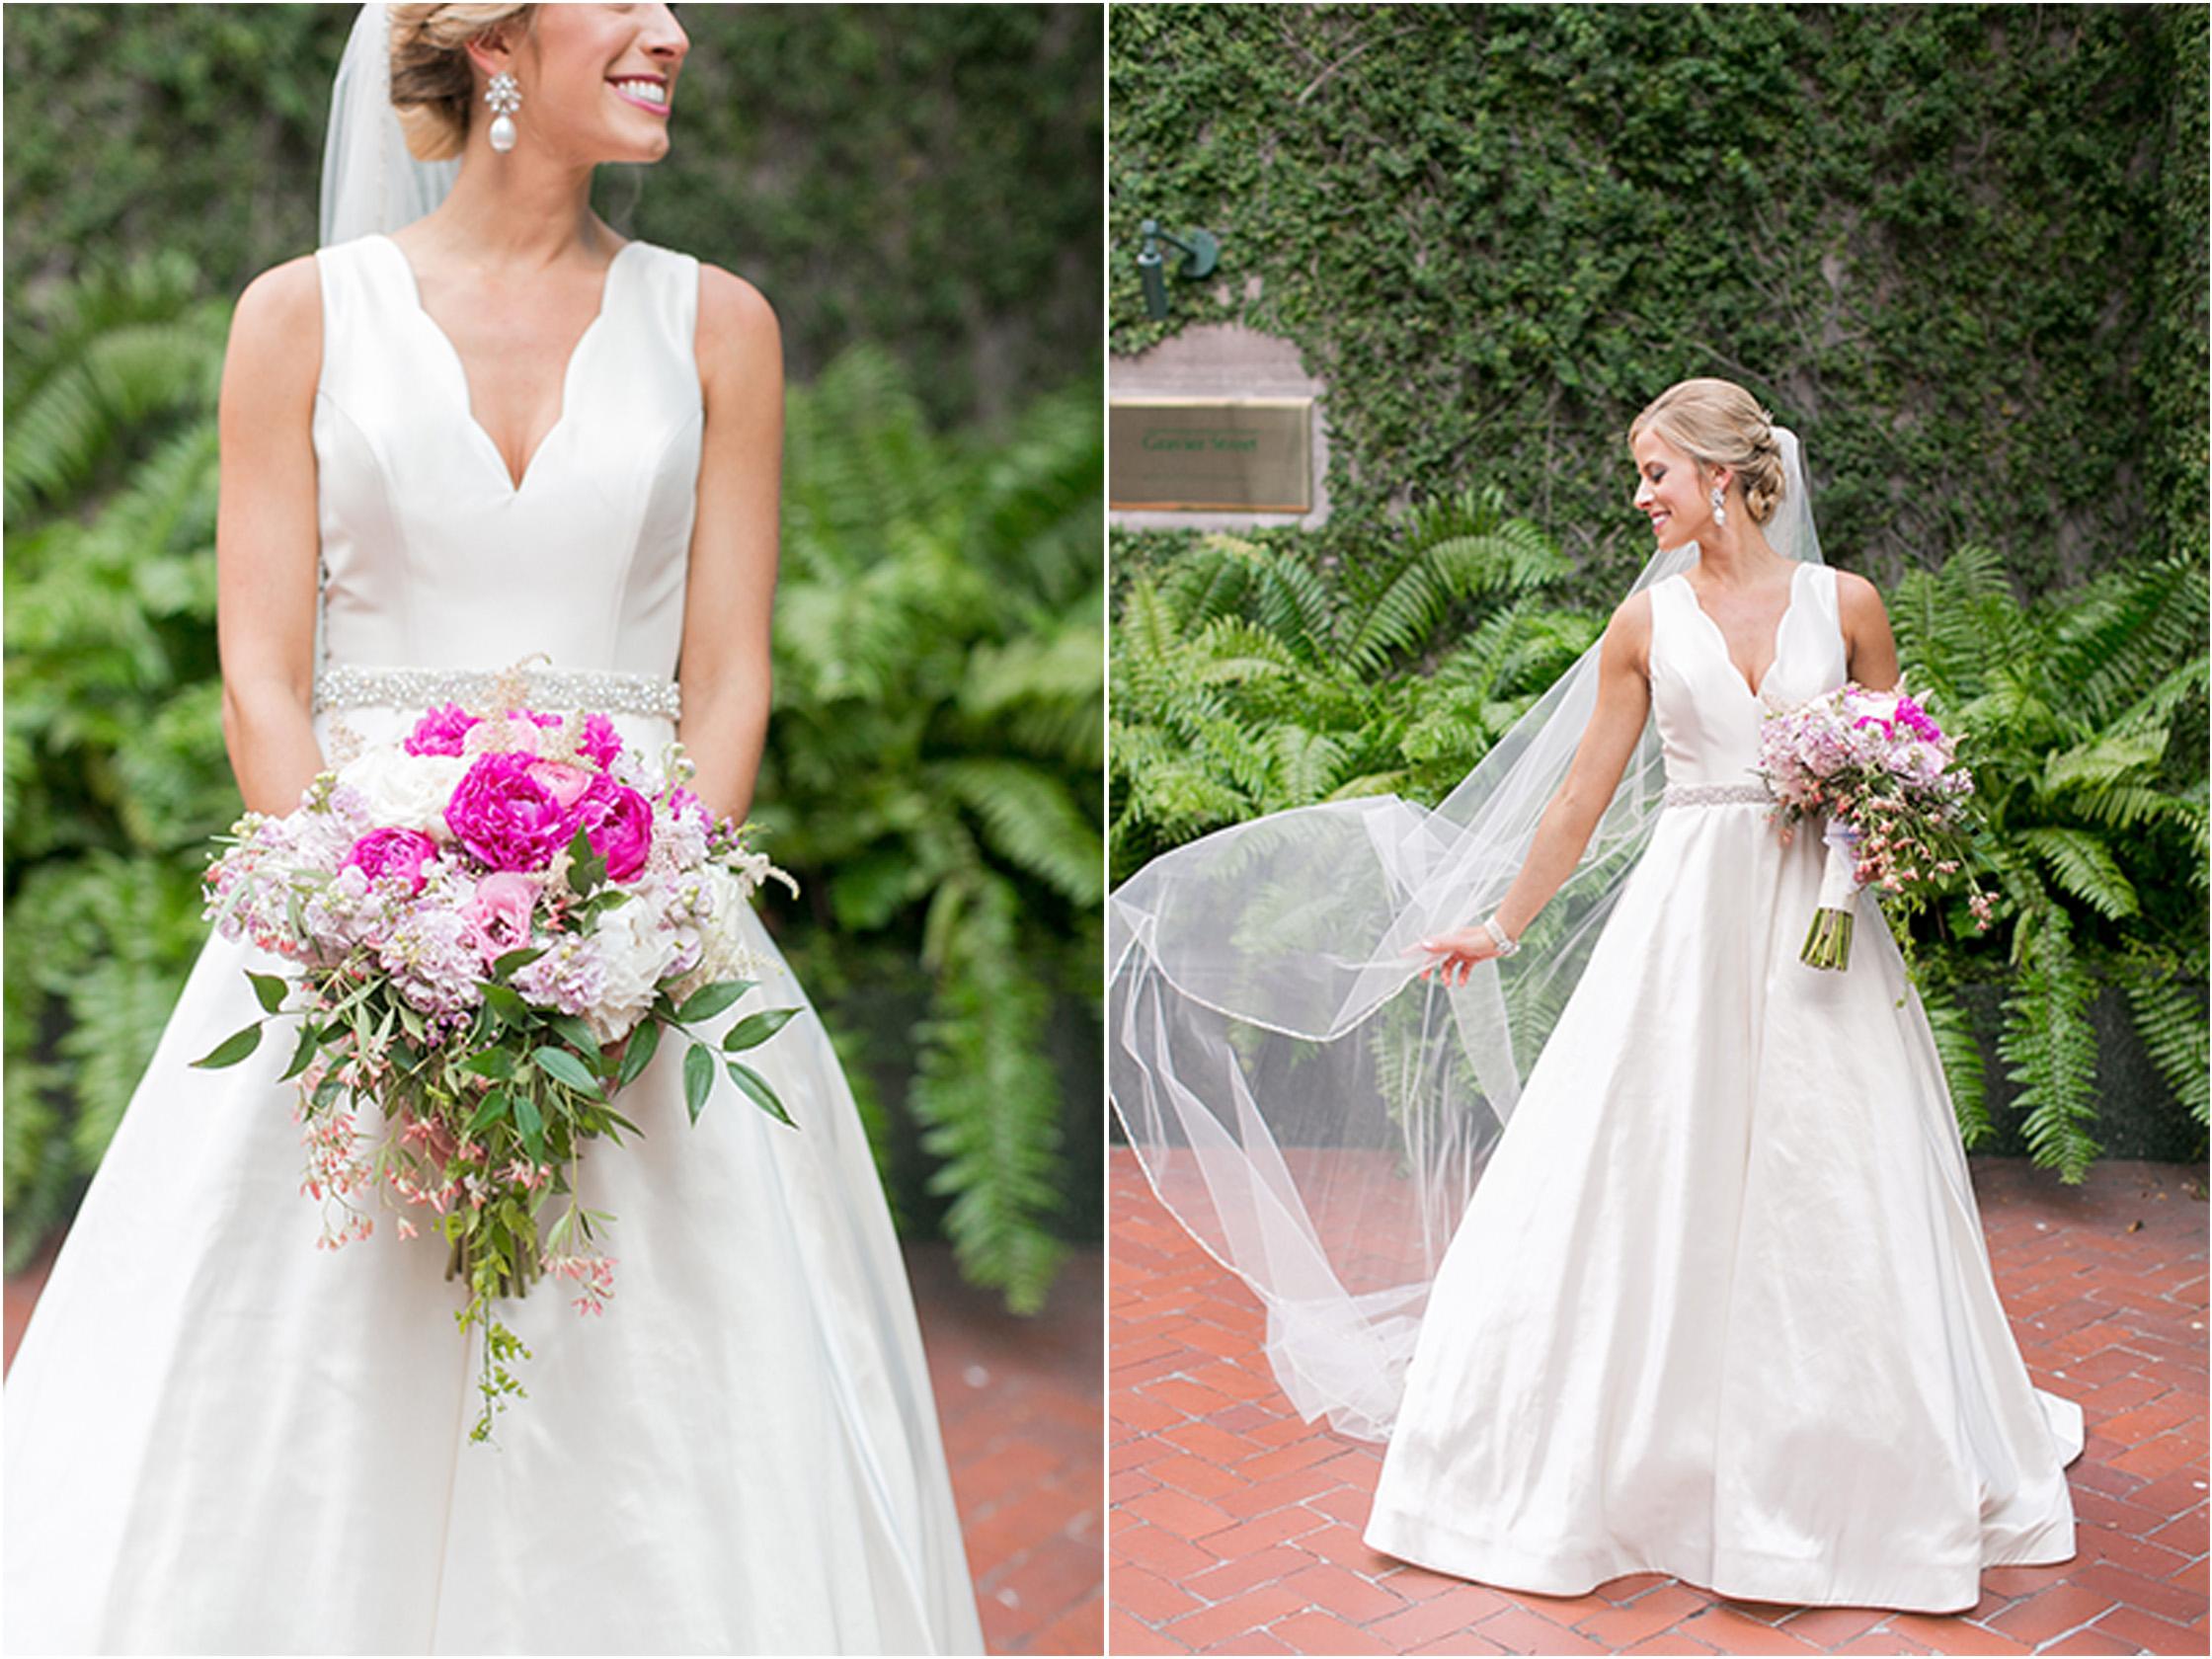 windsor court bride